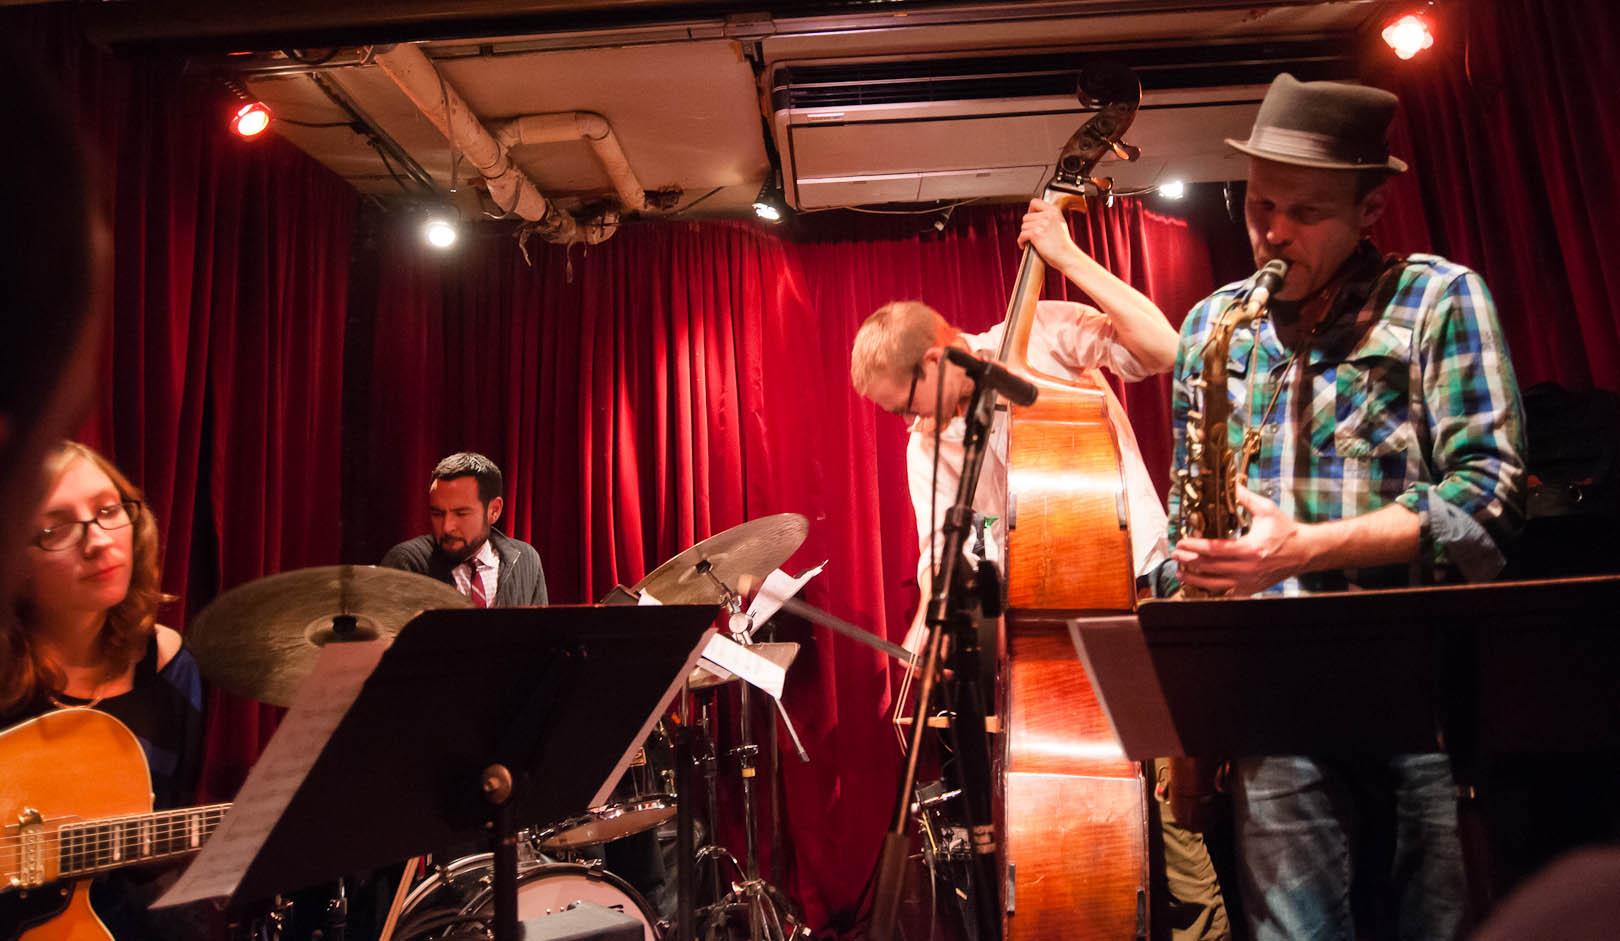 Mary Halvorson, Tomas Fujiwara, Eivind Opsvik, and Chris Speed with Reverse Blue at the Cornelia Street Cafe